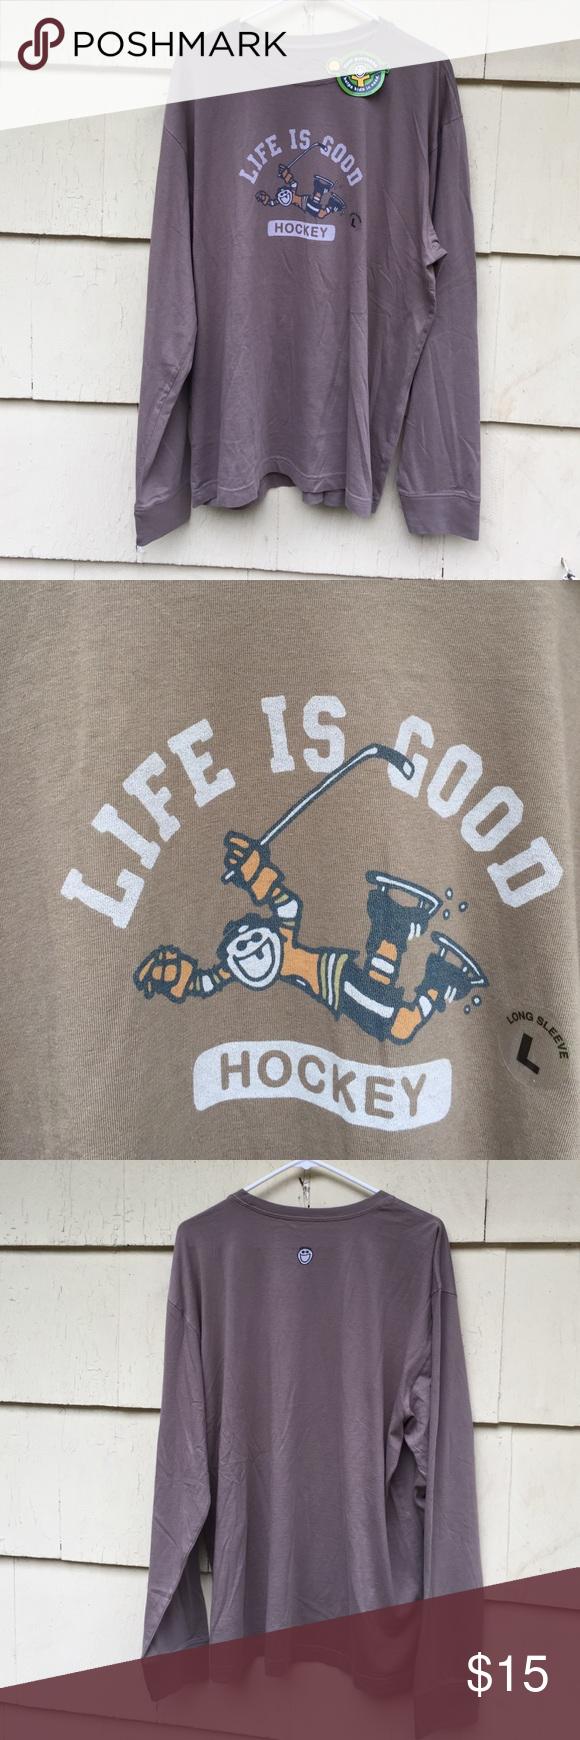 NWT Life Is Good Men's Hockey Shirt Size L Life Is Good NWT Men's Long Sleeve Hockey Shirt. Size Large. Light Brown. No trades Life is Good Shirts Tees - Long Sleeve